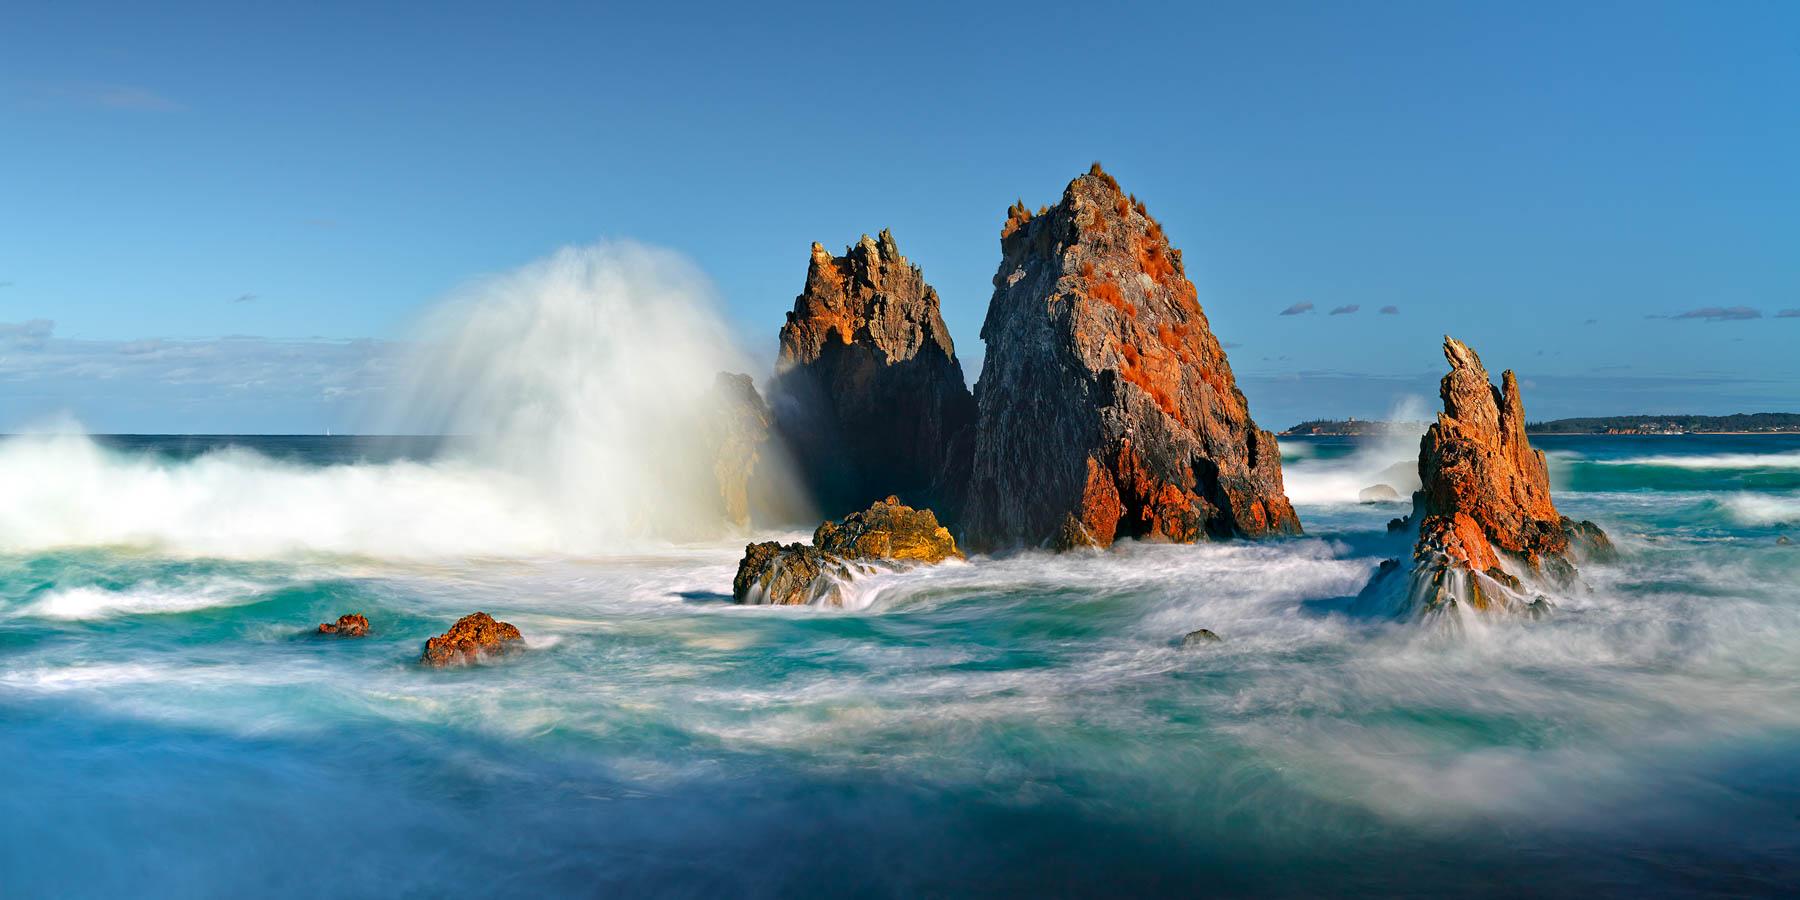 Waves crashing against Camel Rocks near Bermagui, Sapphire Coast, NSW, Australia.